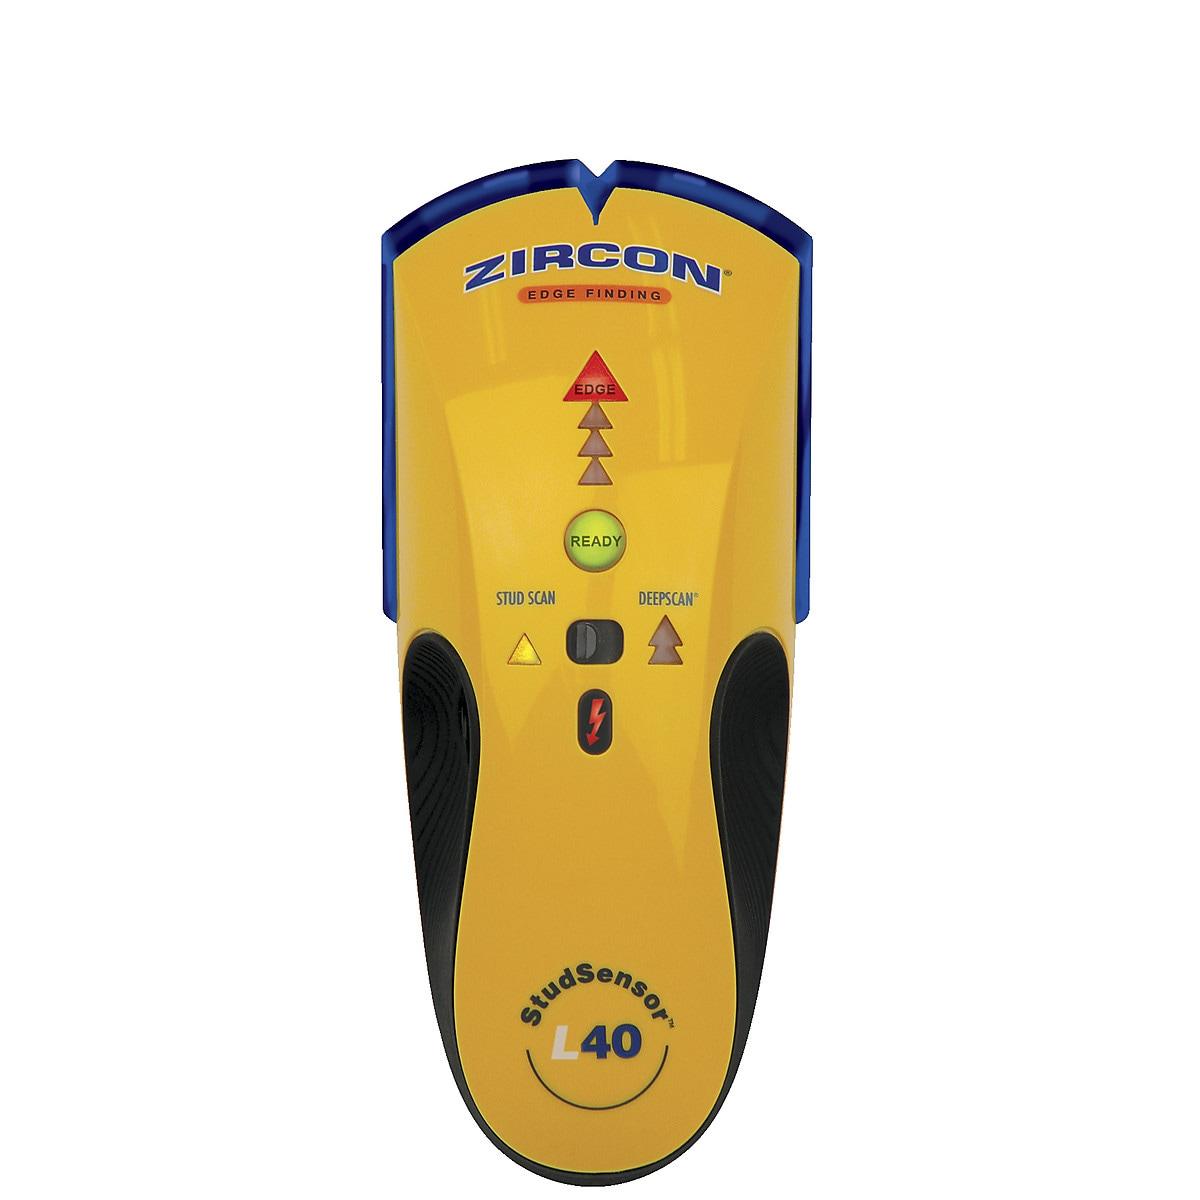 Zircon L40 stenderdetektor